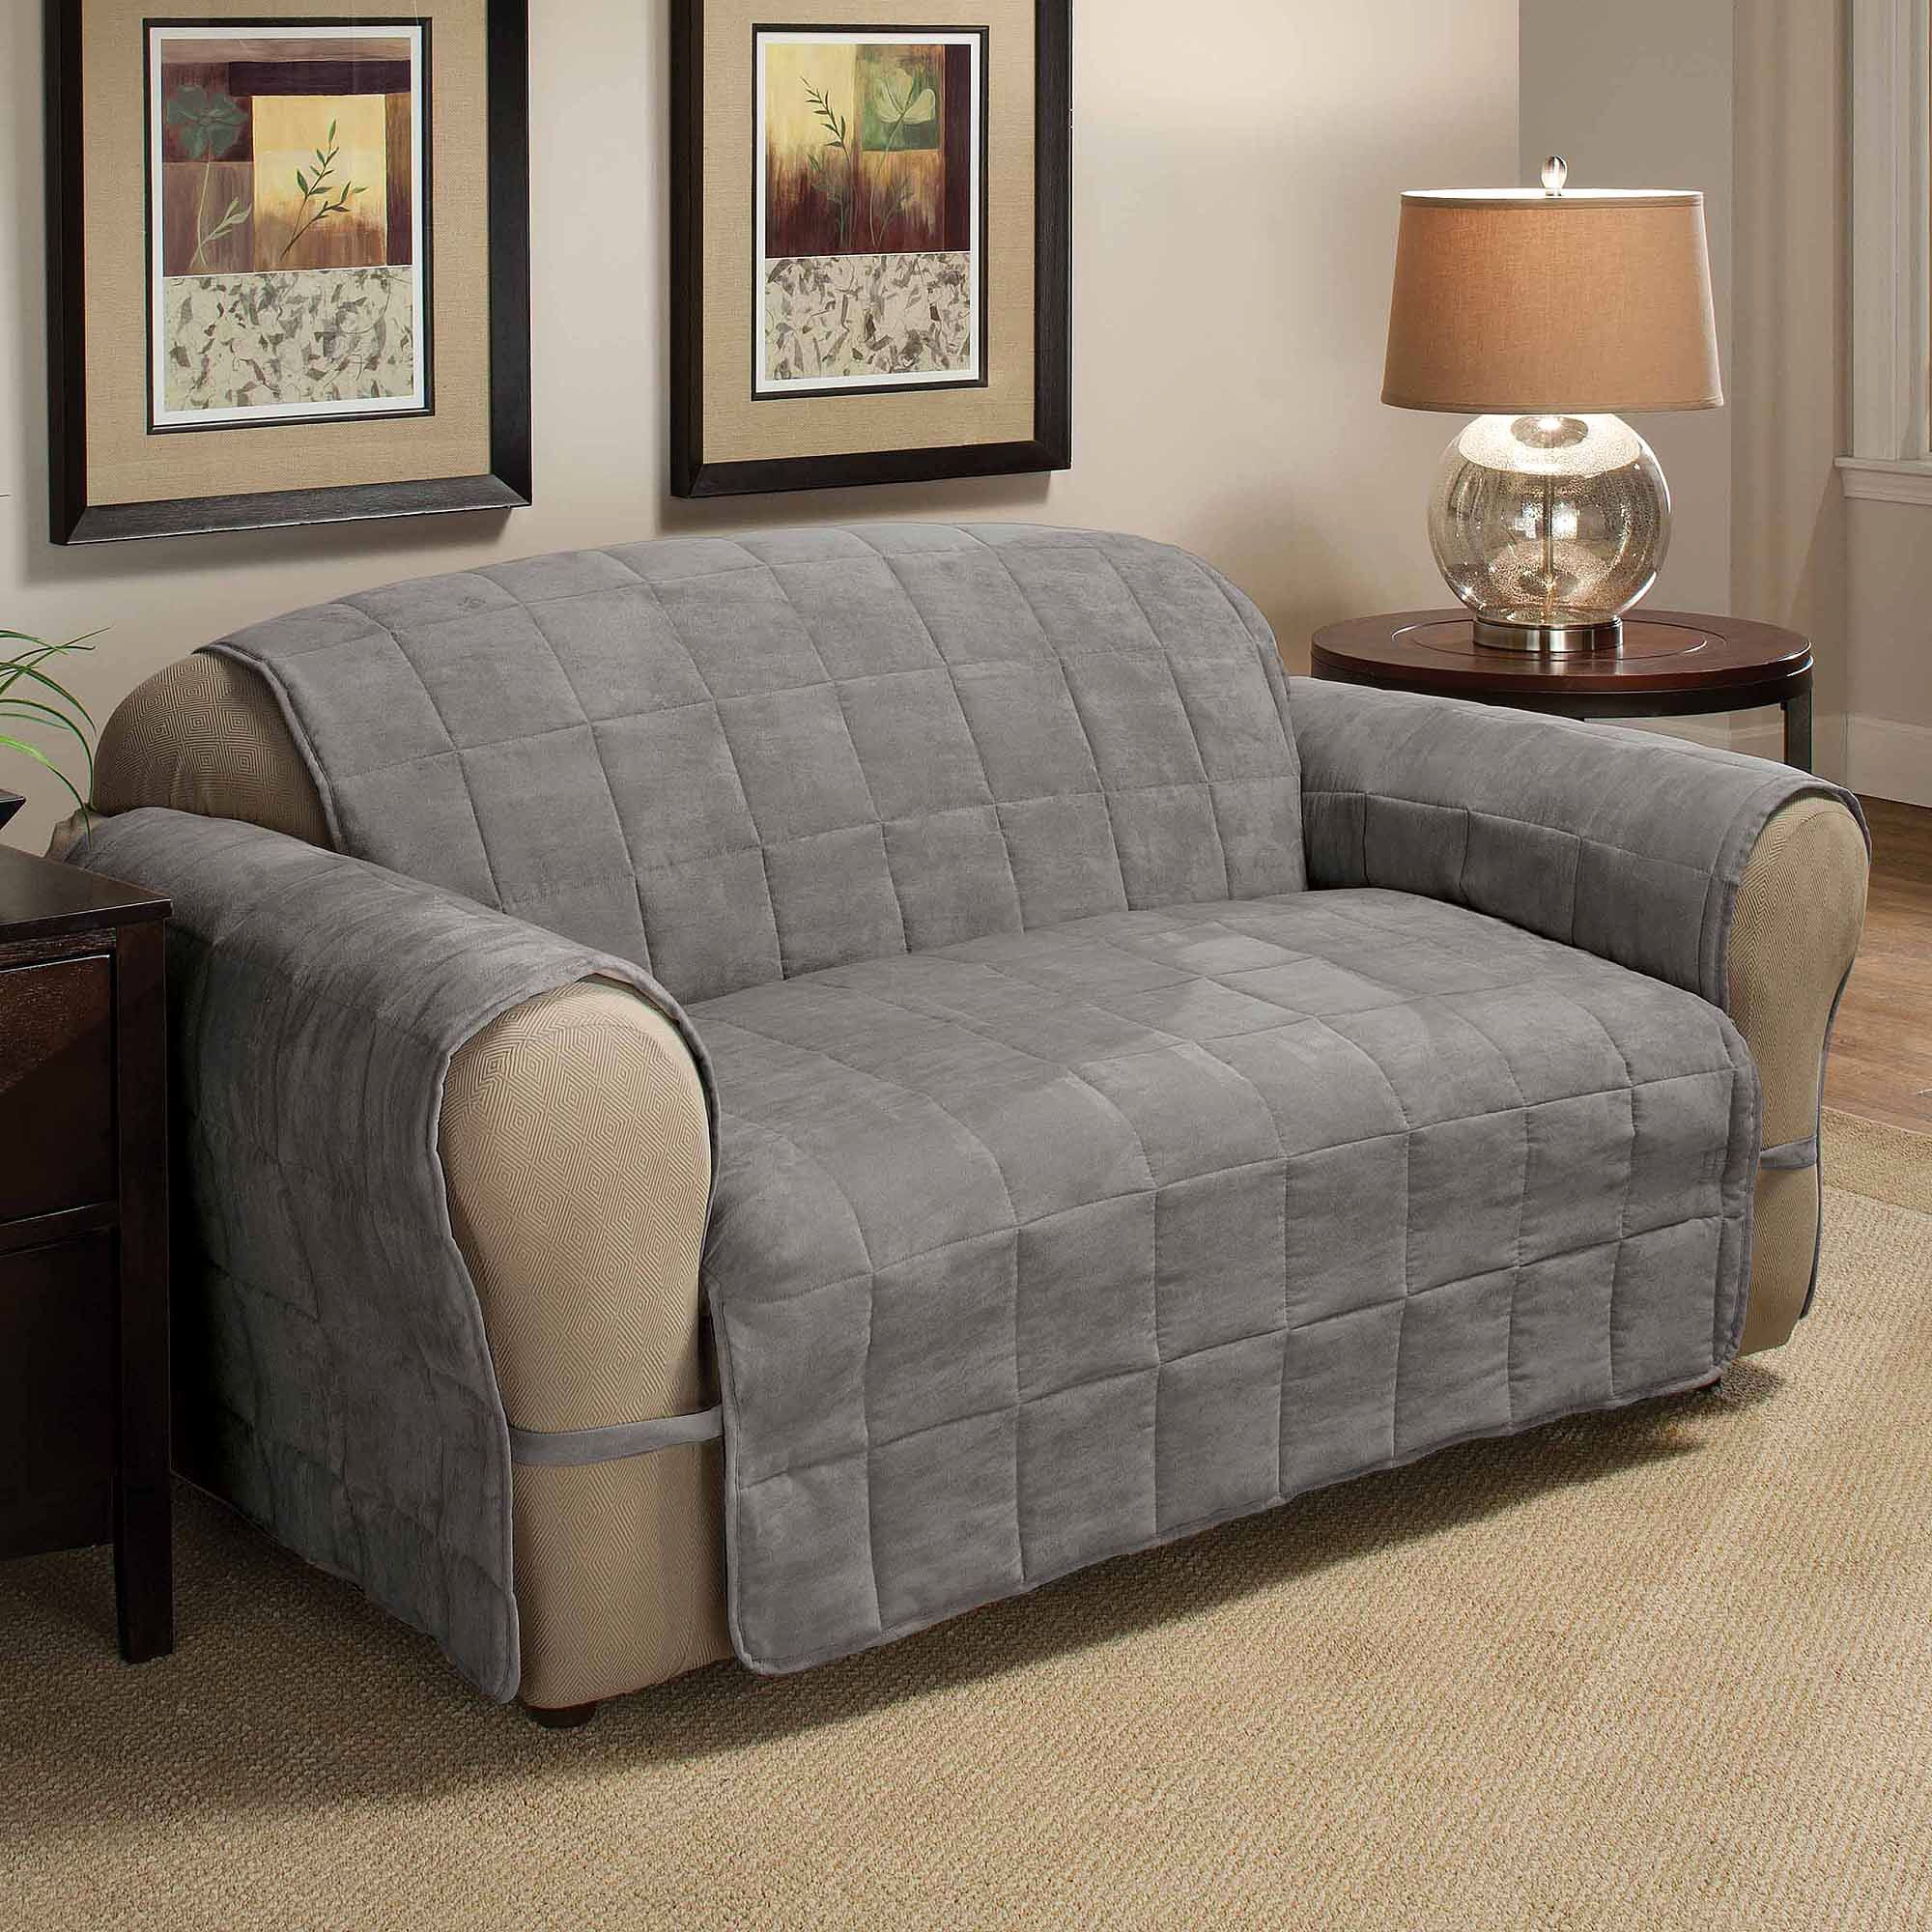 Beautiful Macy S Sofa Covers Picture Macy S Sofa Covers